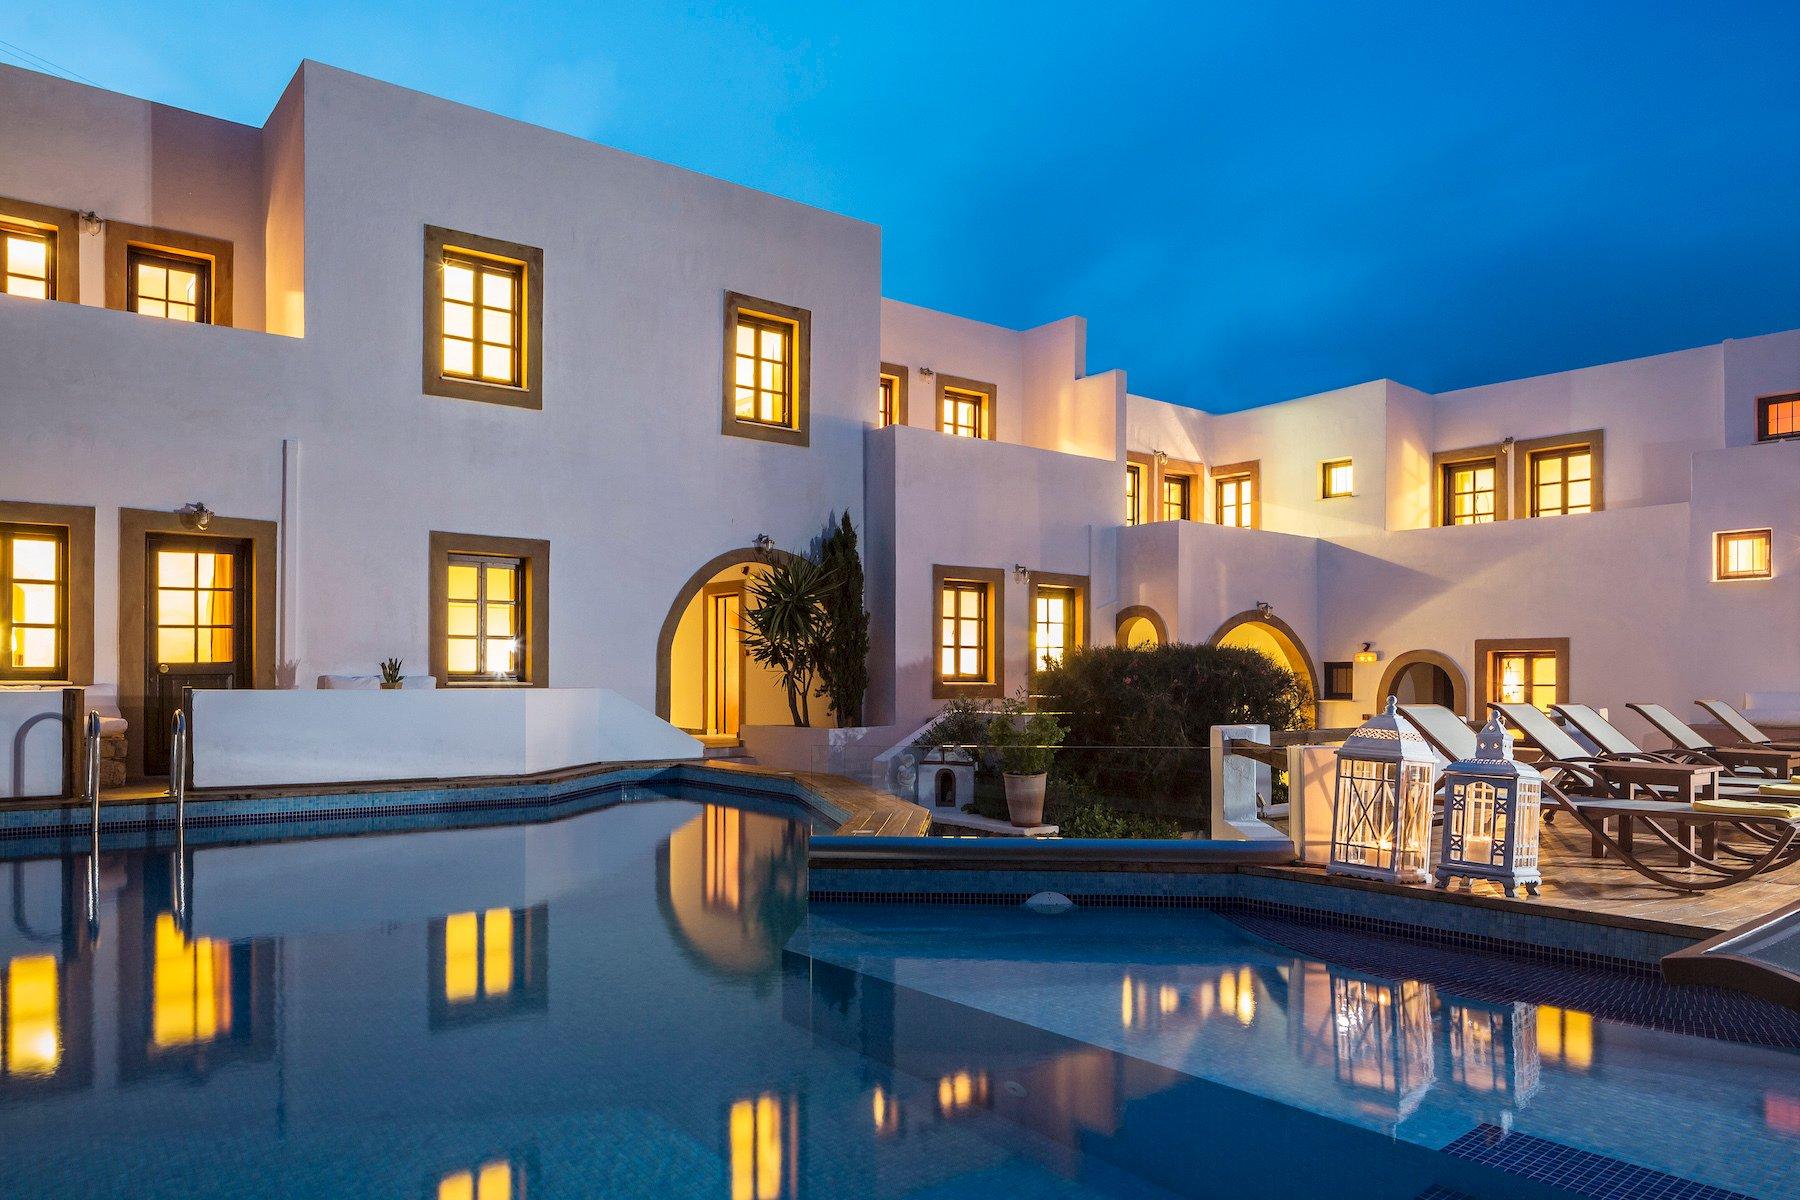 House in Patmos, Greece 1